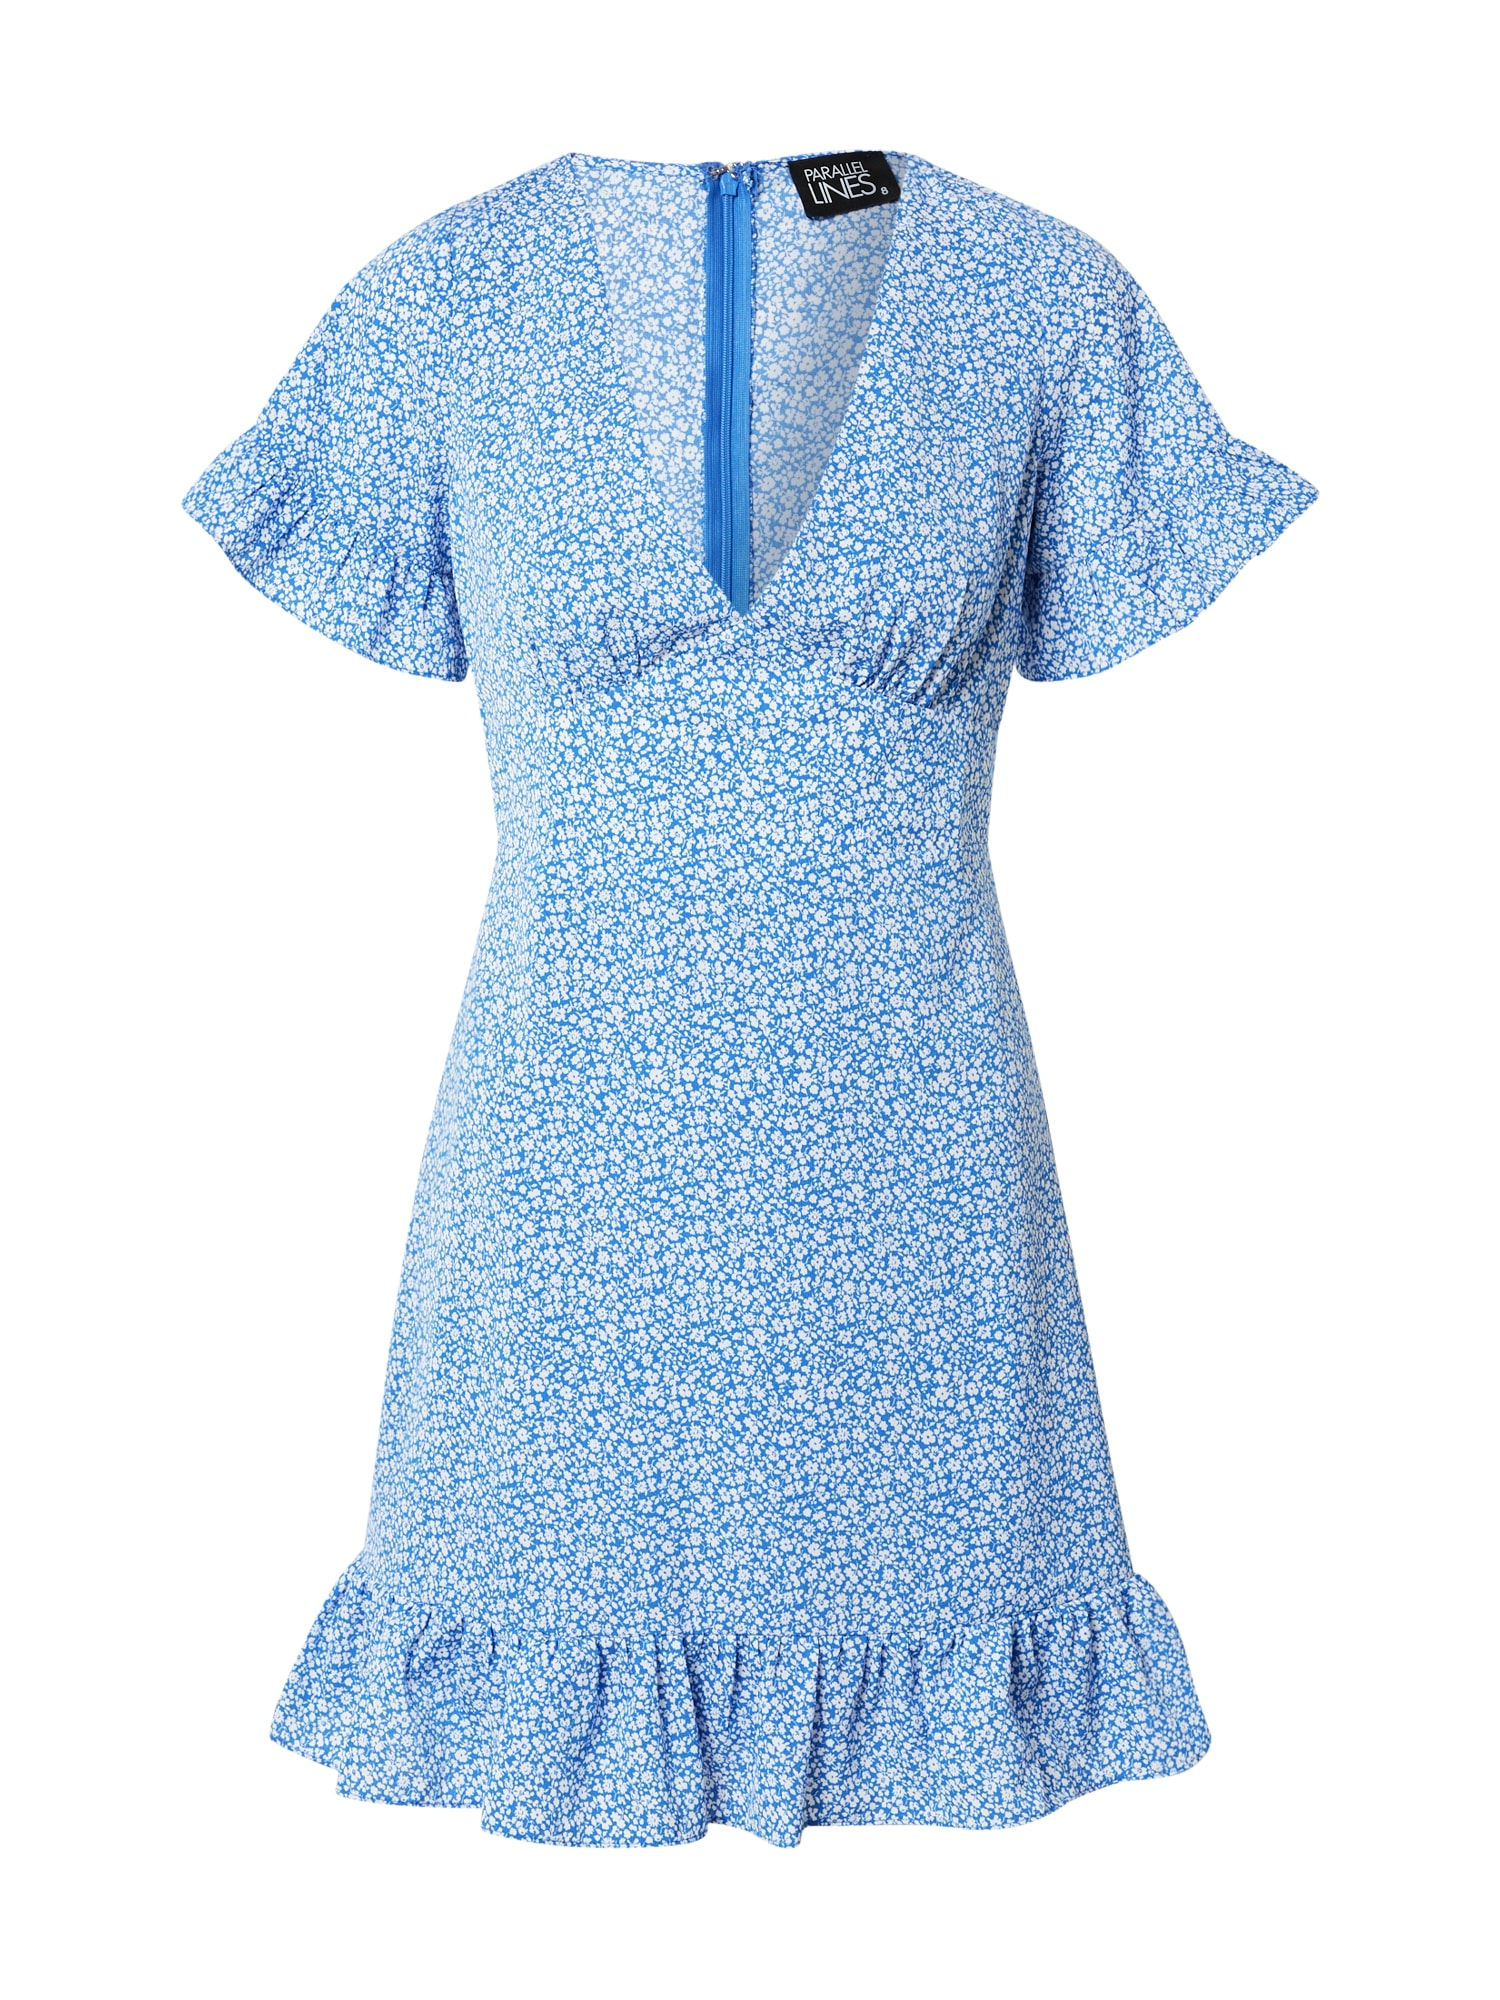 Parallel Lines Suknelė mėlyna / balta